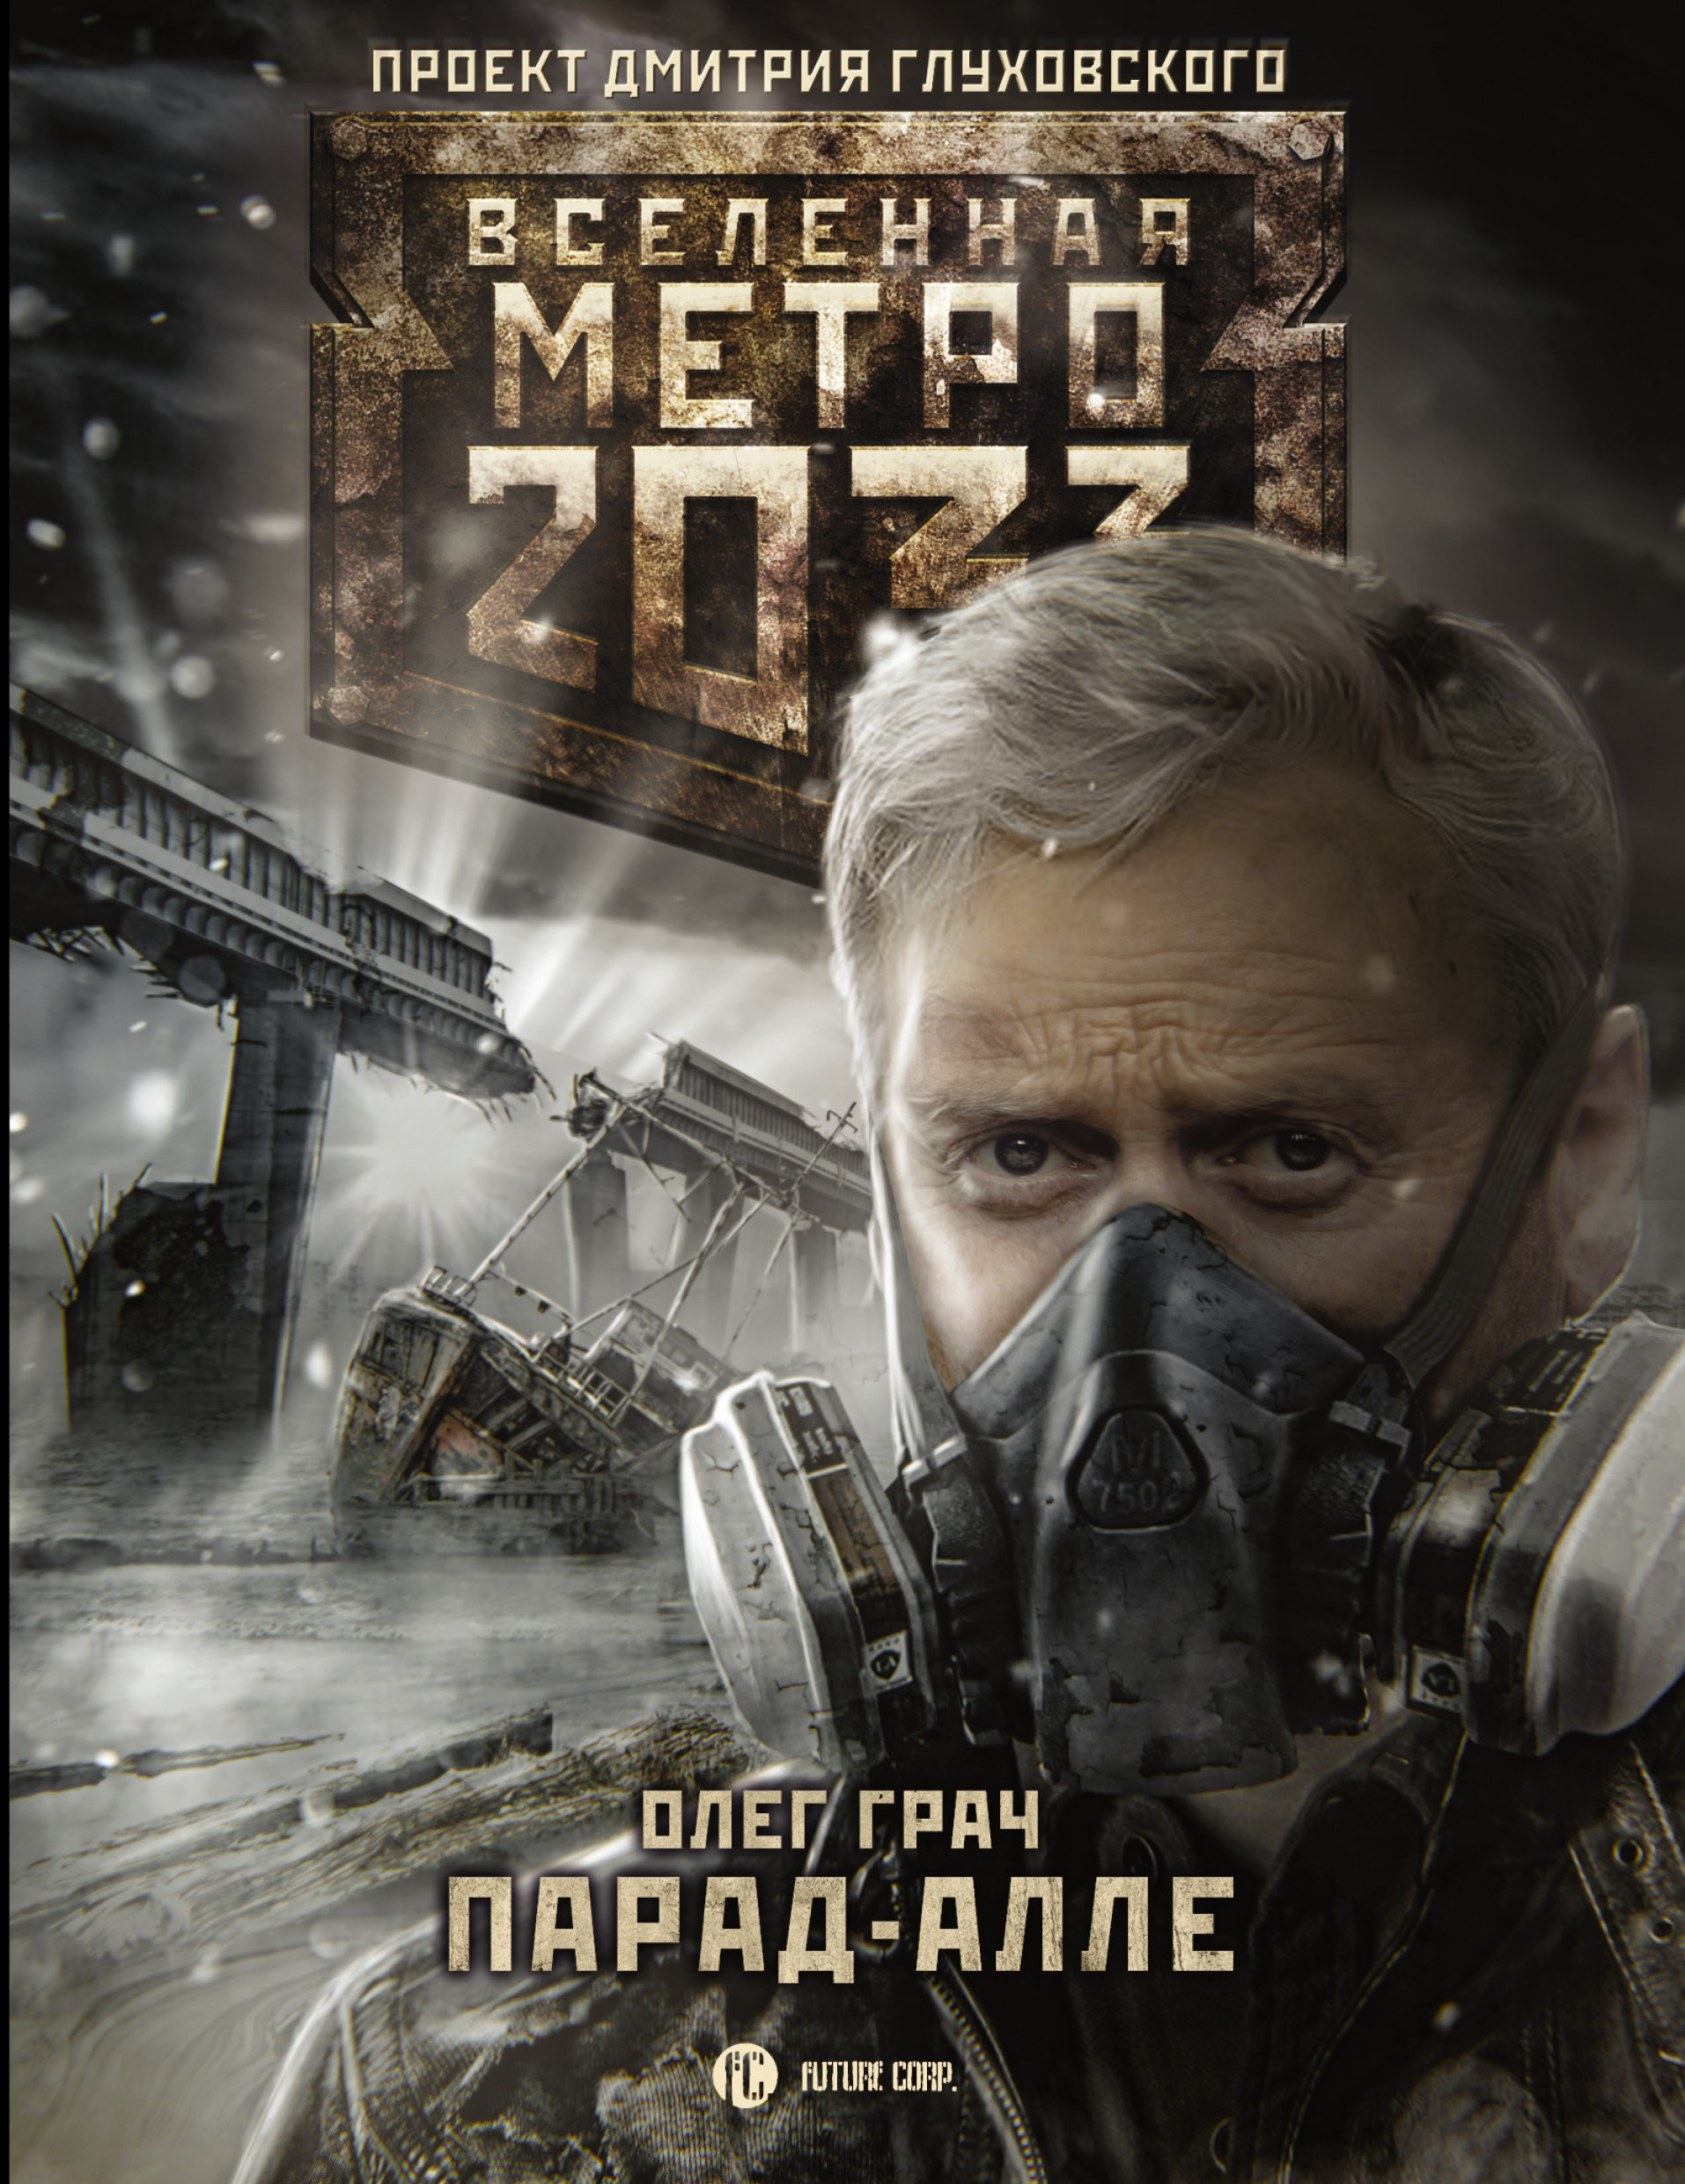 Олег Грач Метро 2033: Парад-алле